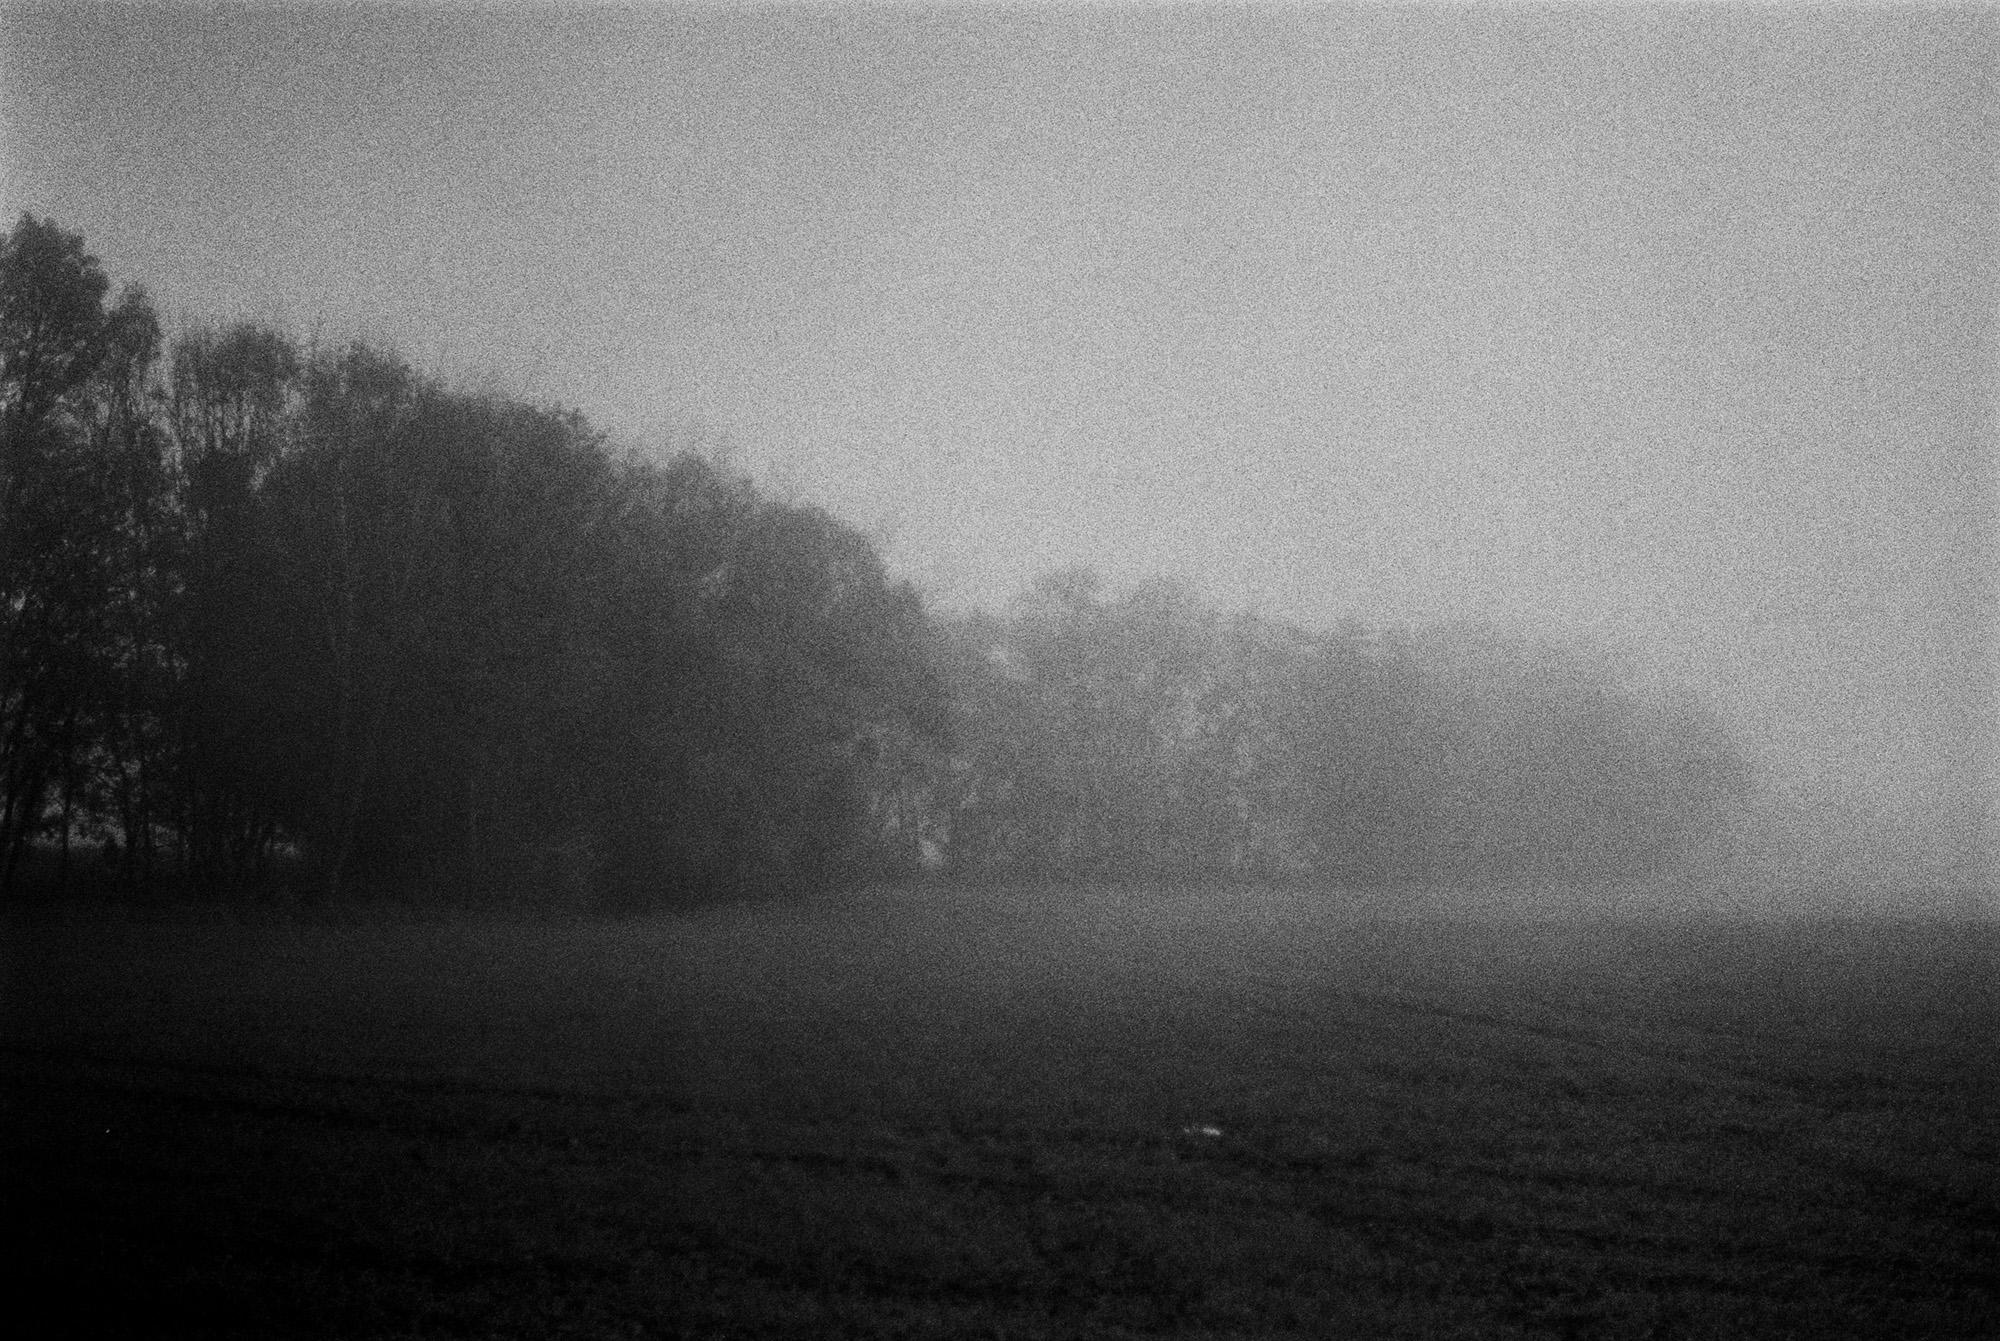 Baeume im Nebel